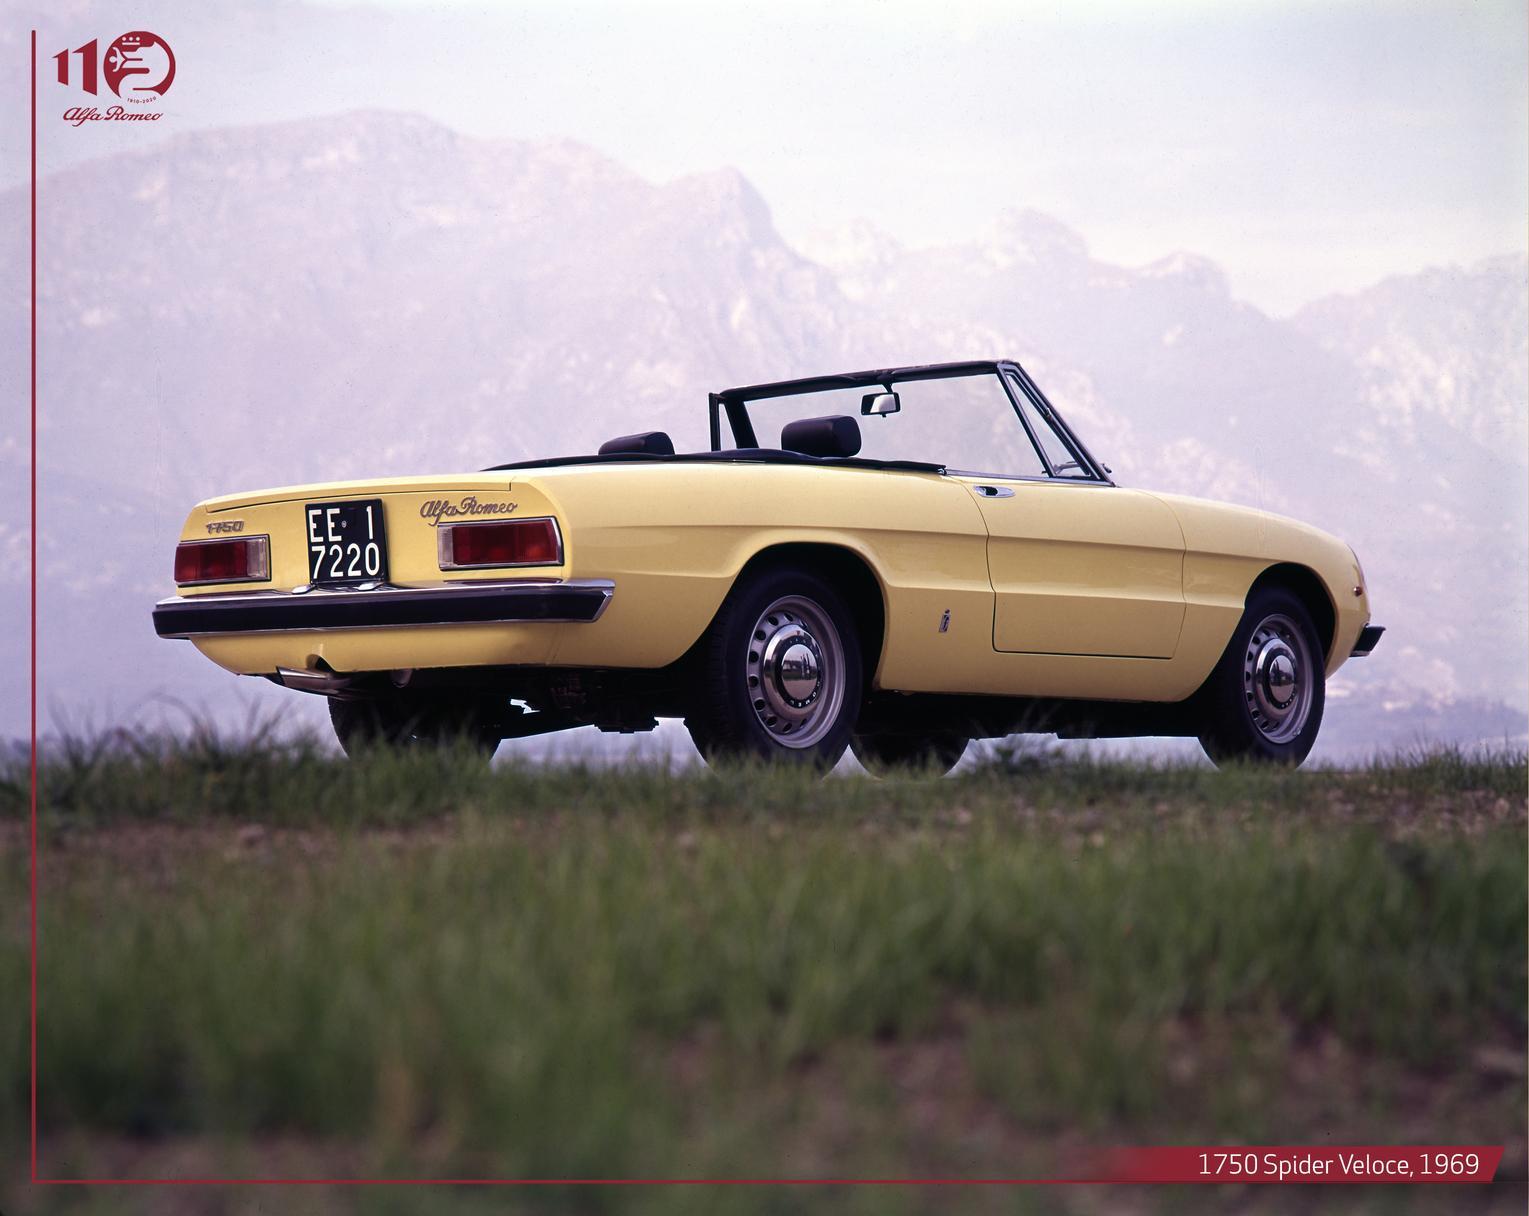 rsz_1750-spider-veloce-1969.jpg